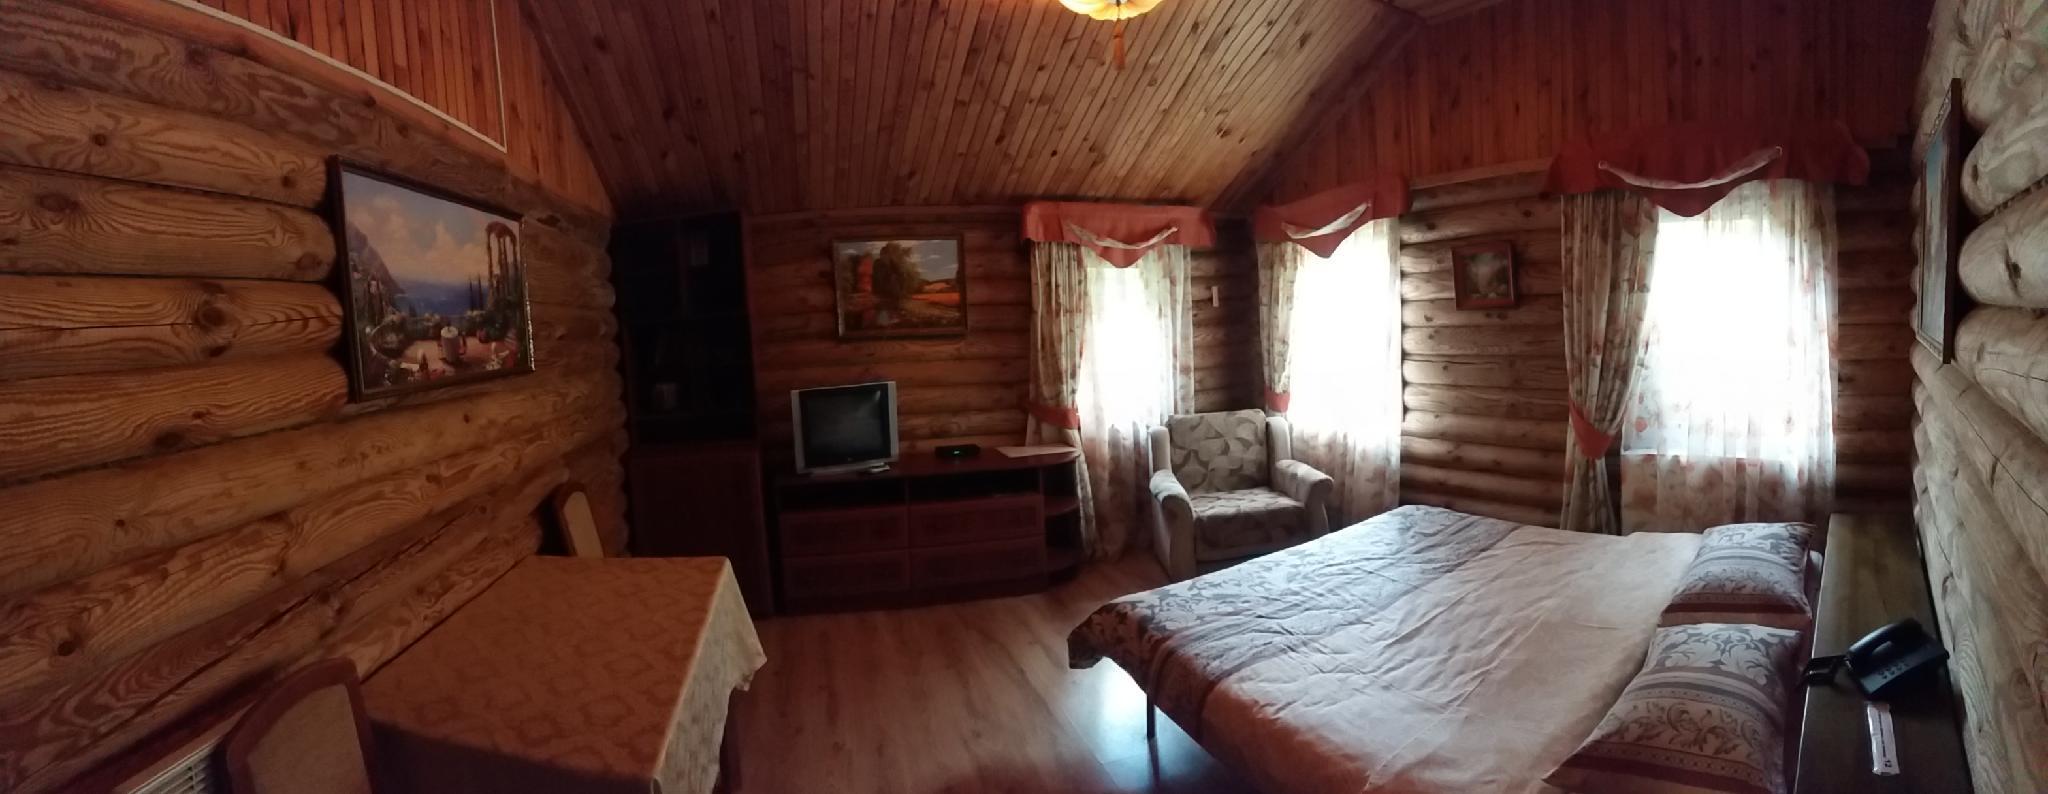 House  2 In The Park Area Of Chernihiv